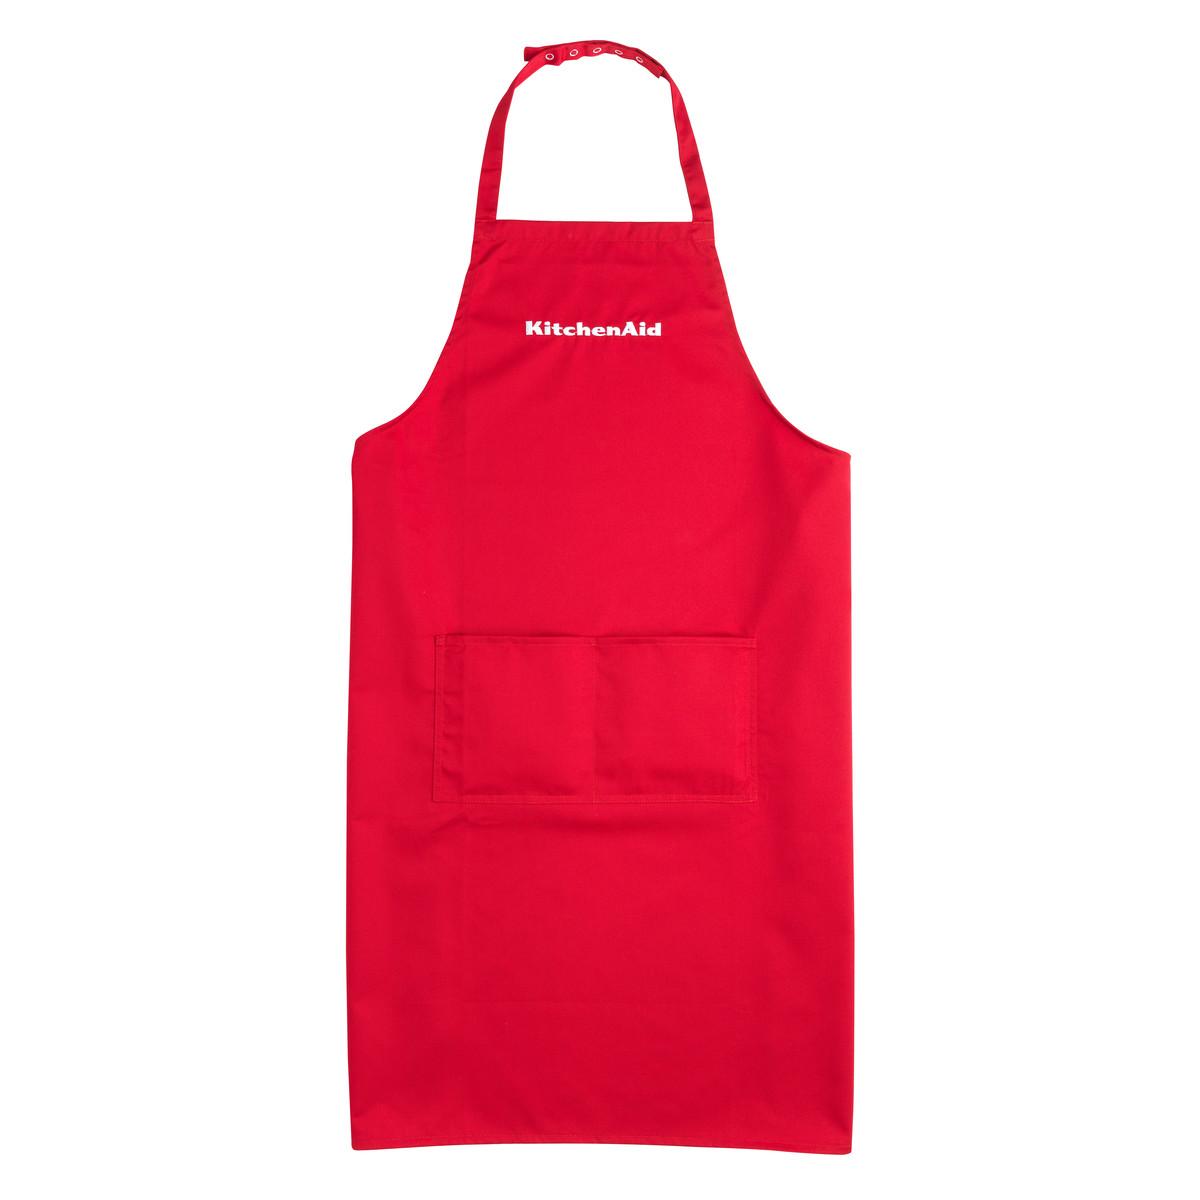 KitchenAid KSM200 Kochschürzen Set Swiss Edition, rot